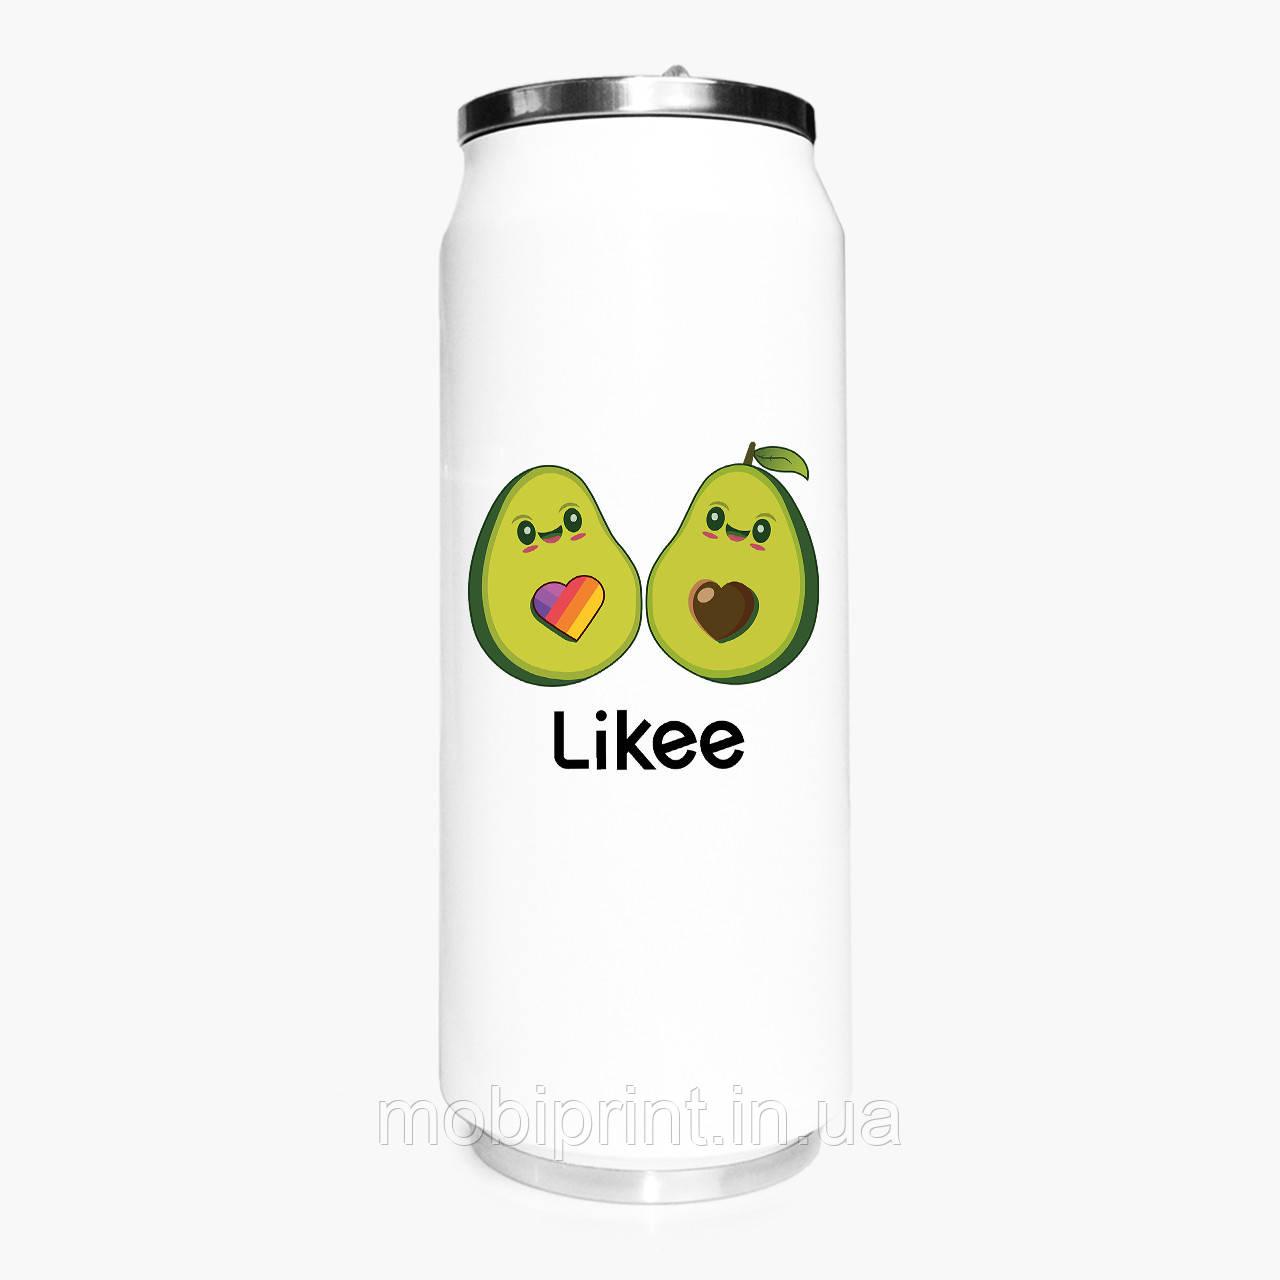 Термобанка Лайк Авокадо (Likee Avocado) 500 мл (31091-1031-1) термокружка из нержавеющей стали